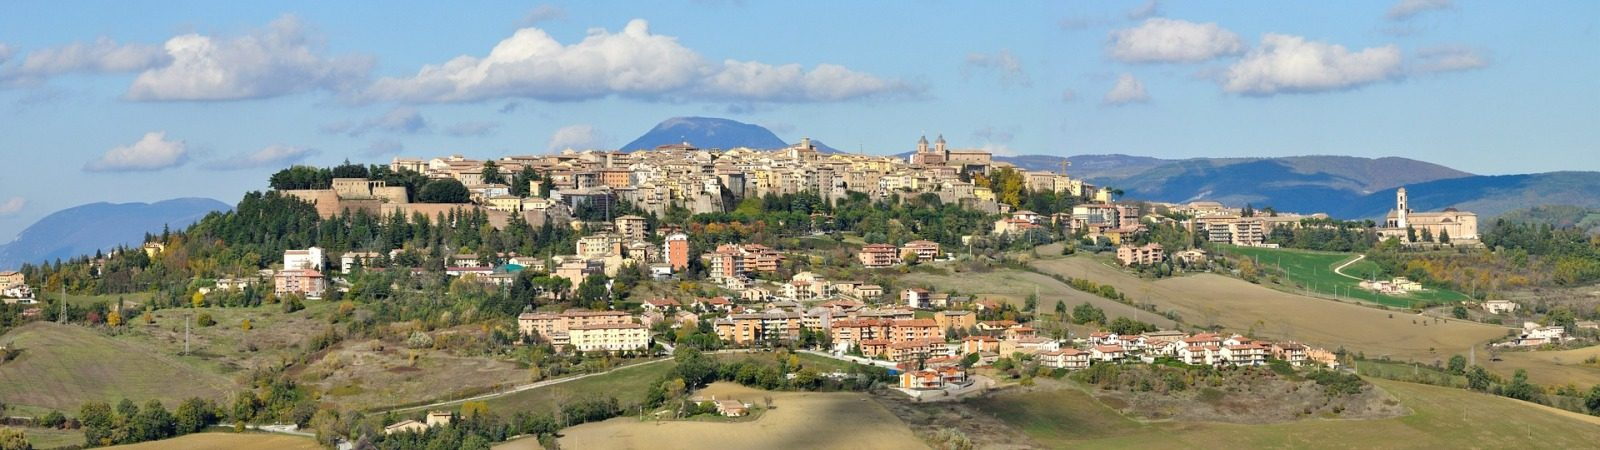 panorama Italy 1600x450